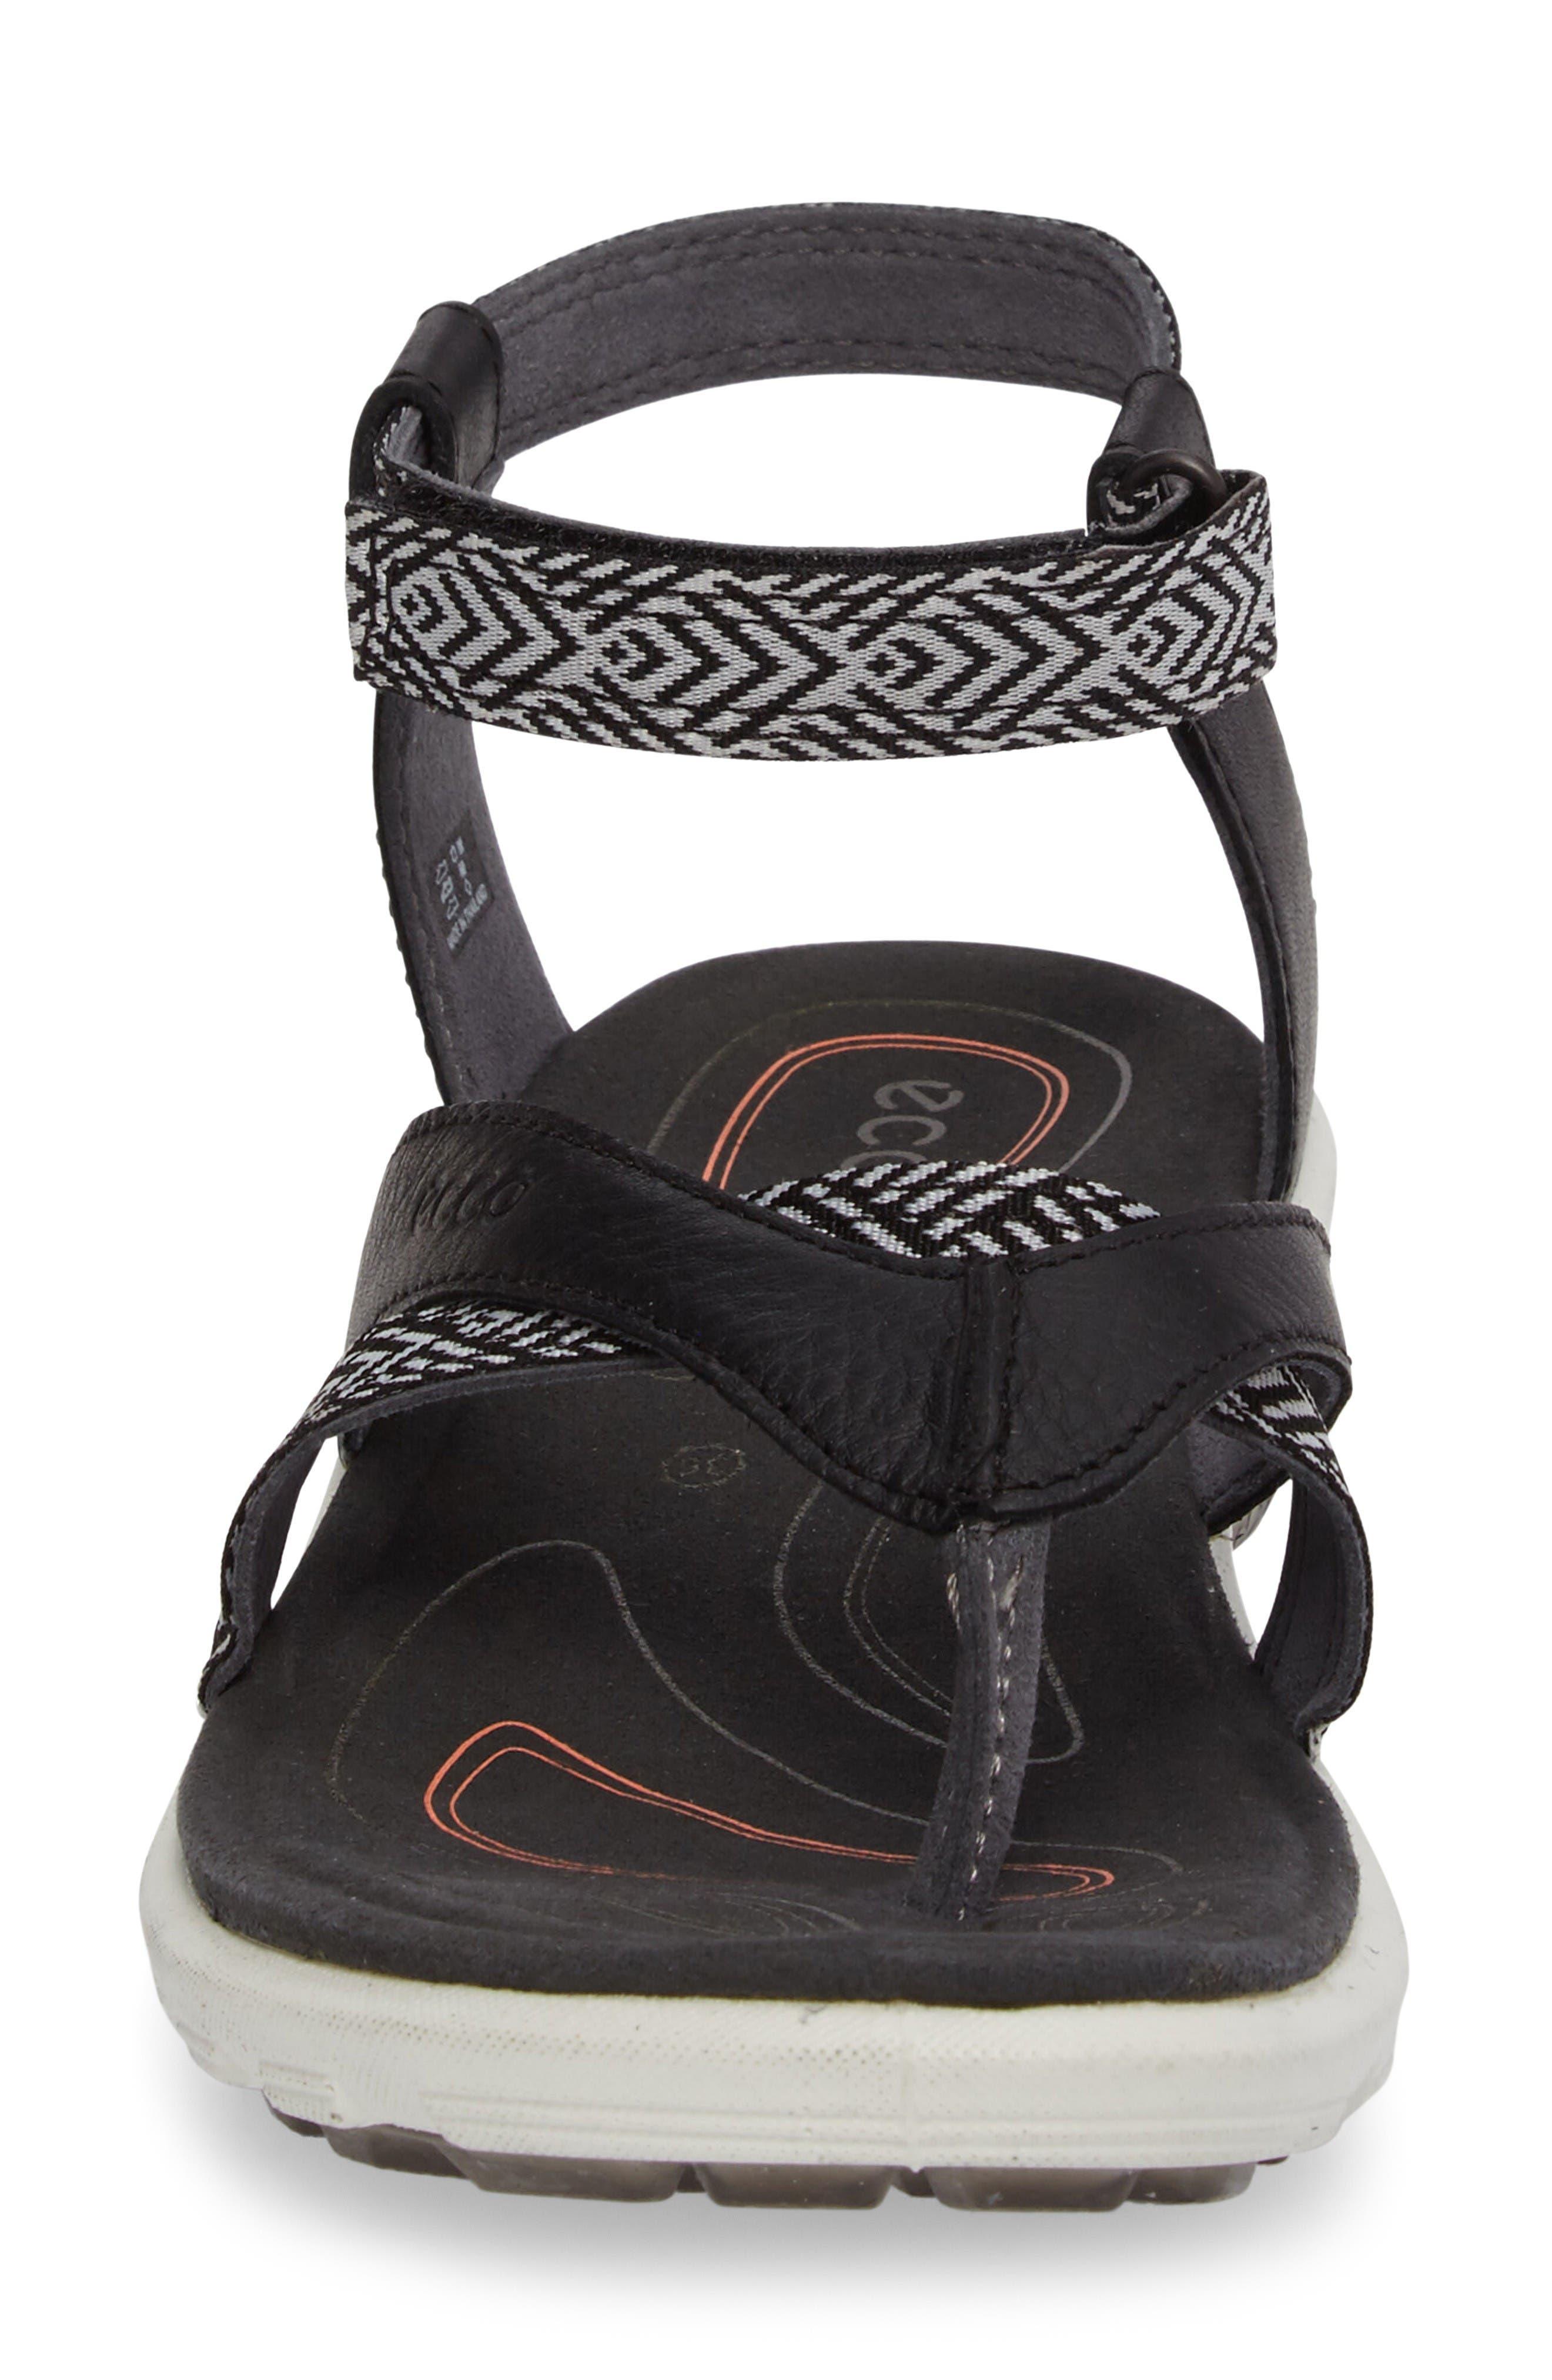 Cruise Sport Sandal,                             Alternate thumbnail 4, color,                             Black Leather